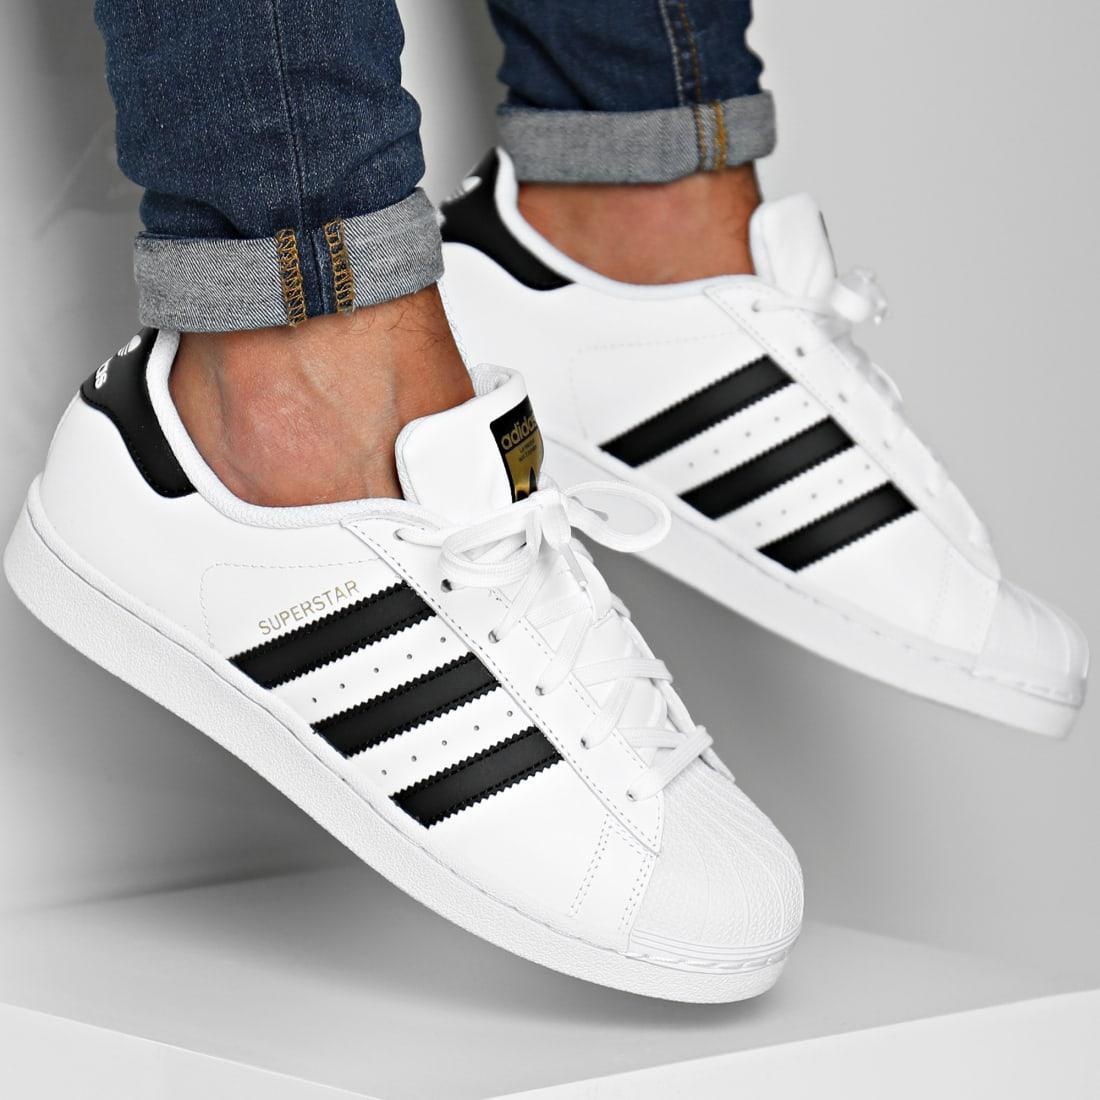 adidas Baskets Superstar C77124 Footwear White Core Black